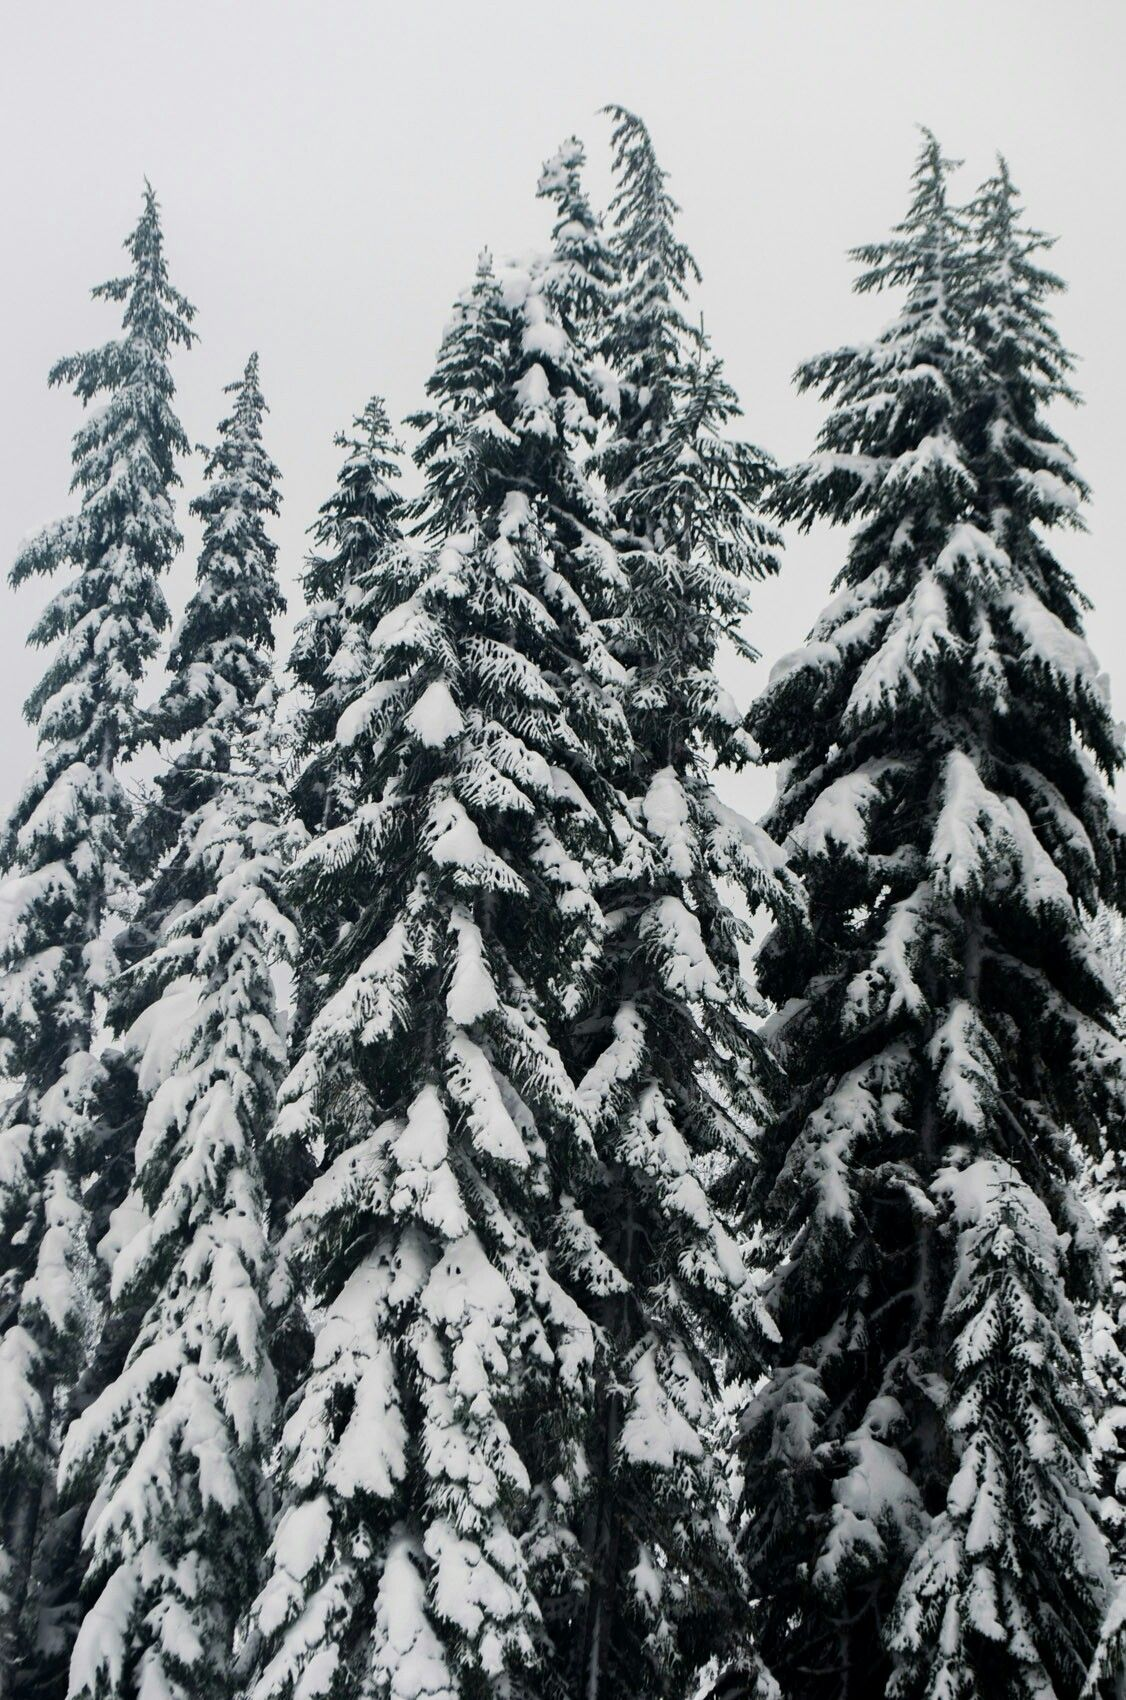 Winter Christmas Aesthetic Winter Christmas Winter Wonderland